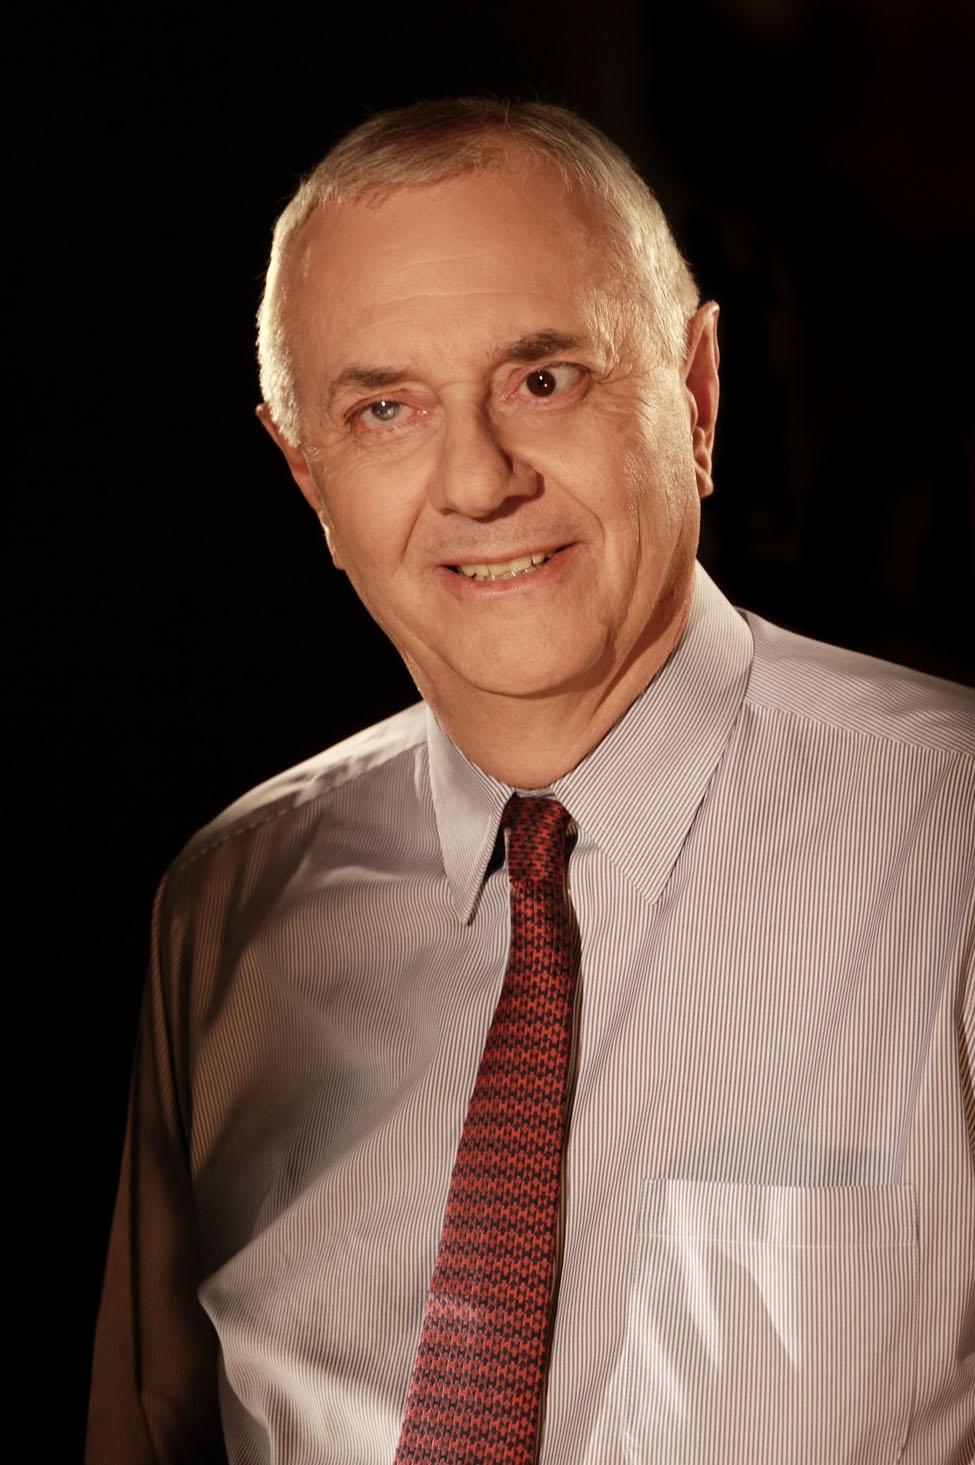 Philippe Tillous-Borde